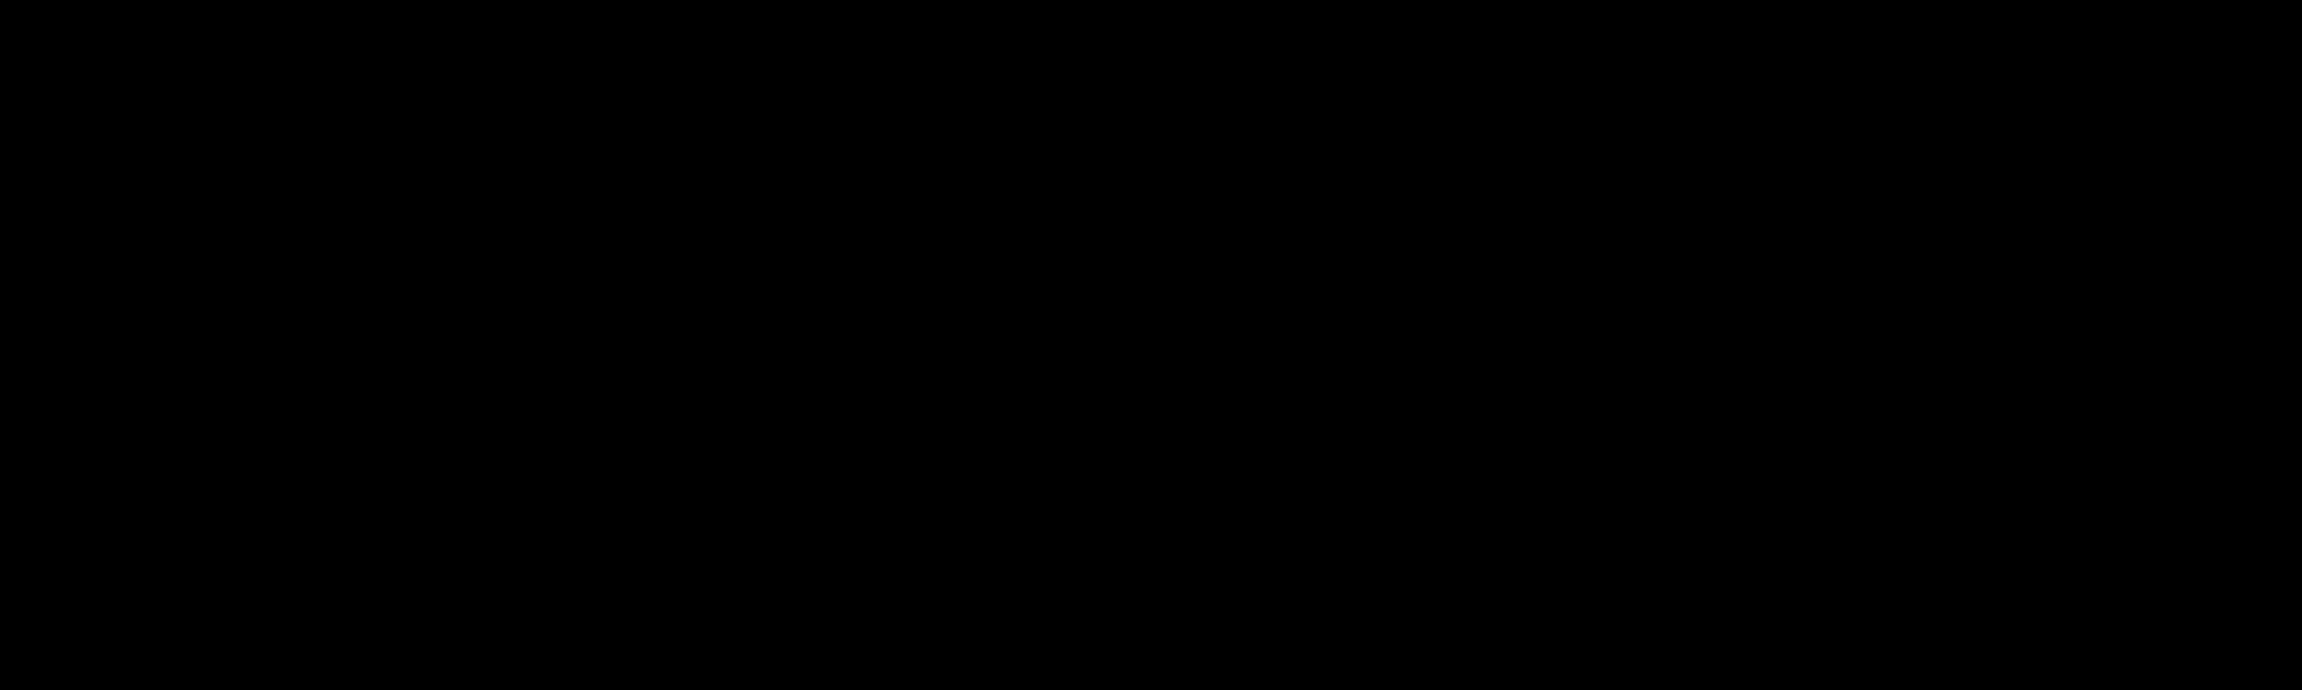 Aripiprazole N1-oxide-d<sub>8</sub> (piperazine-d<sub>8</sub>)